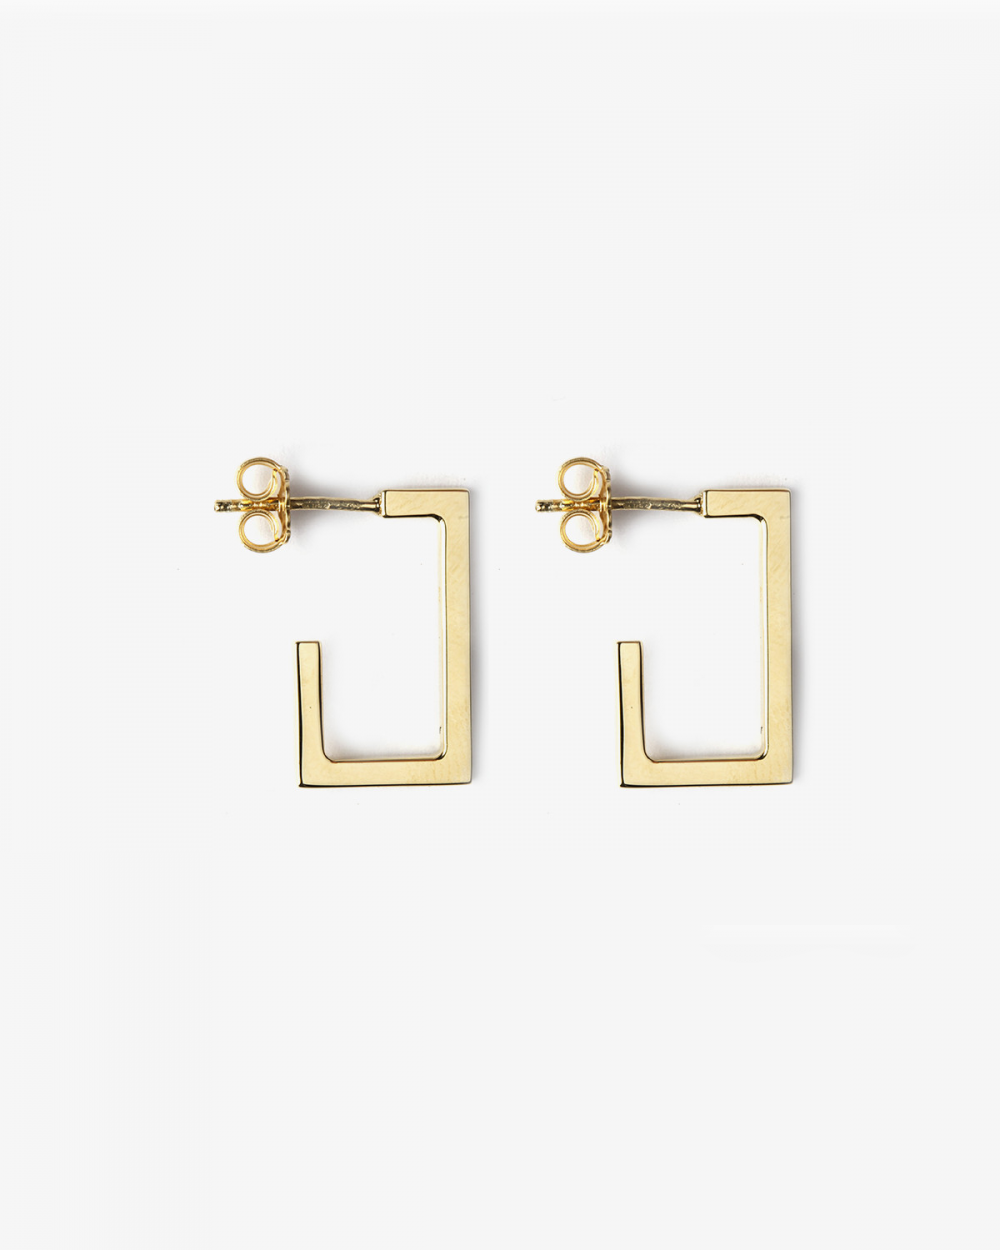 Earrings YELLOW GOLD RECTANGULAR PLATE SMALL EARRINGS NOVE25